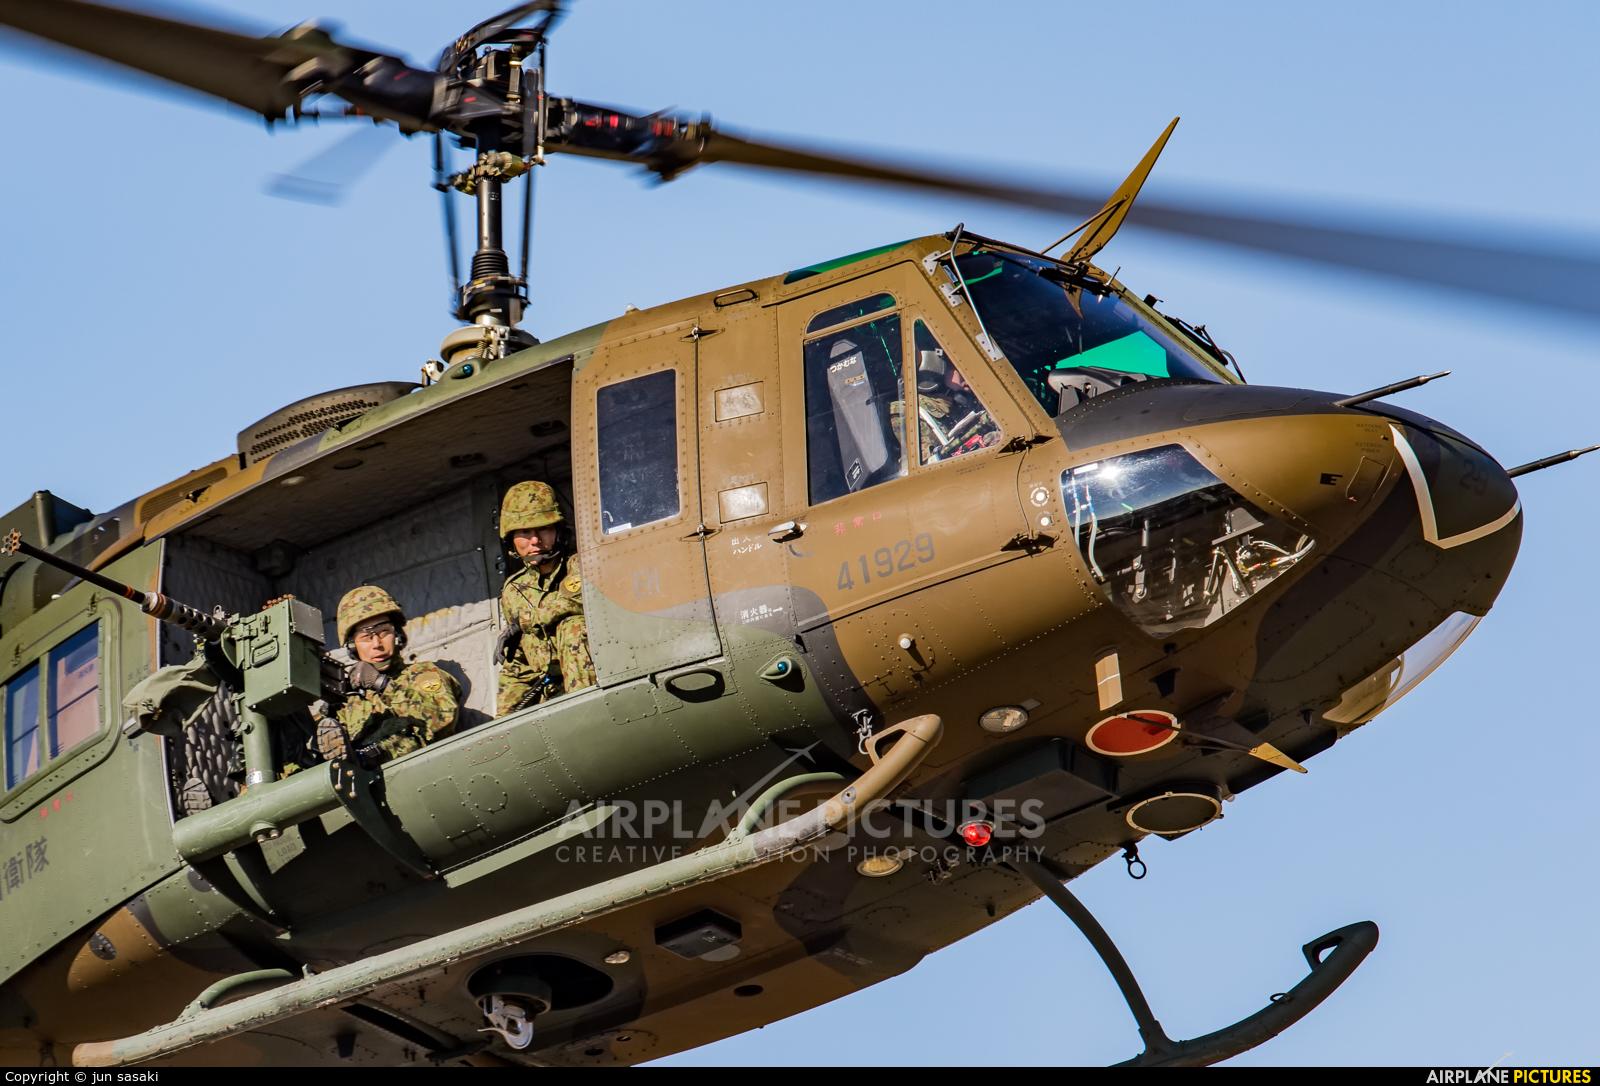 Japan - Ground Self Defense Force 41929 aircraft at Off Airport - Japan